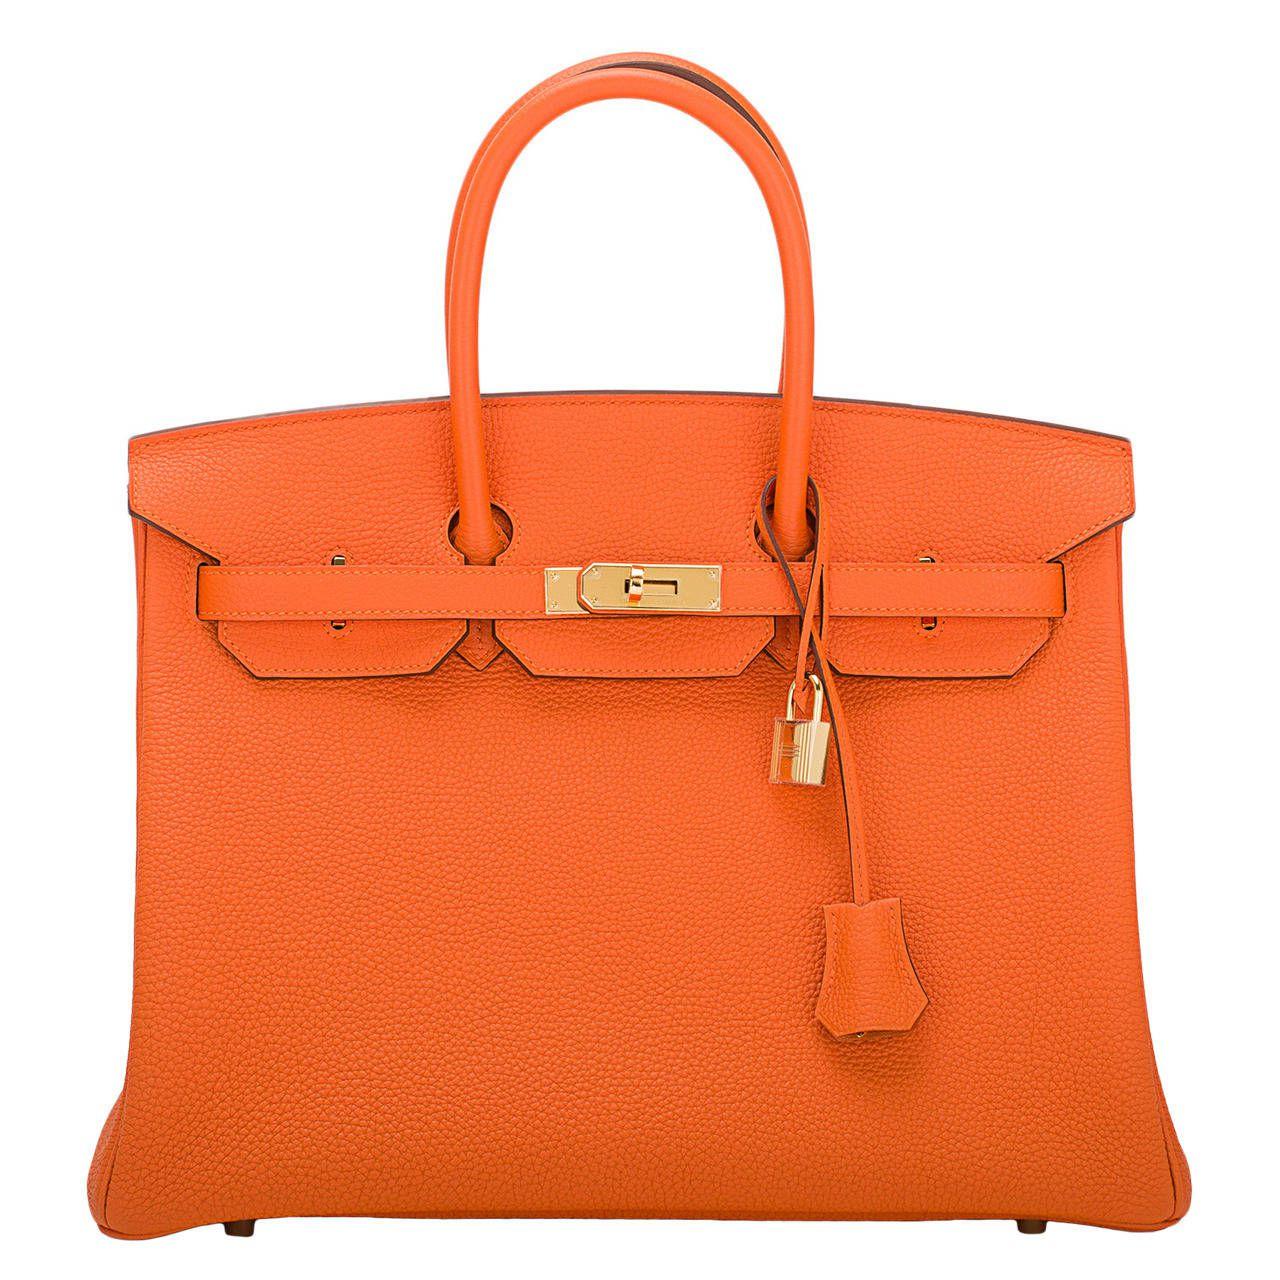 Hermes Handbag Msrp